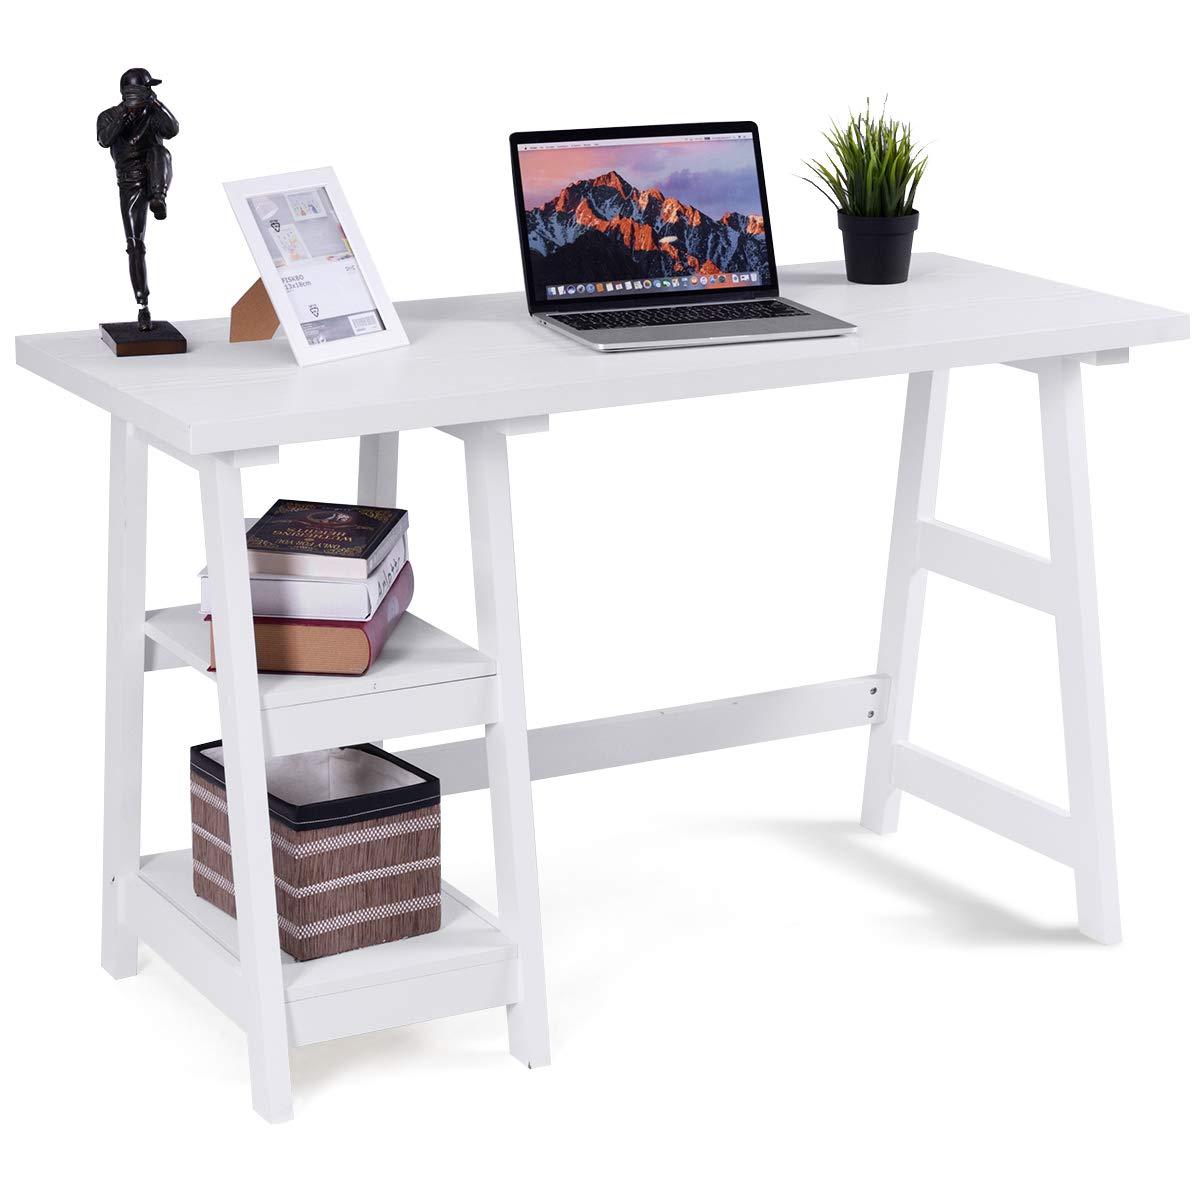 Tangkula Writing Computer Desk, Trestle Desk Study Desk, Laptop PC Desk, Modern Wood Vintage Style Reversible Storage Shelf, Home Office Furniture Sturdy Table Study Table (White) by Tangkula